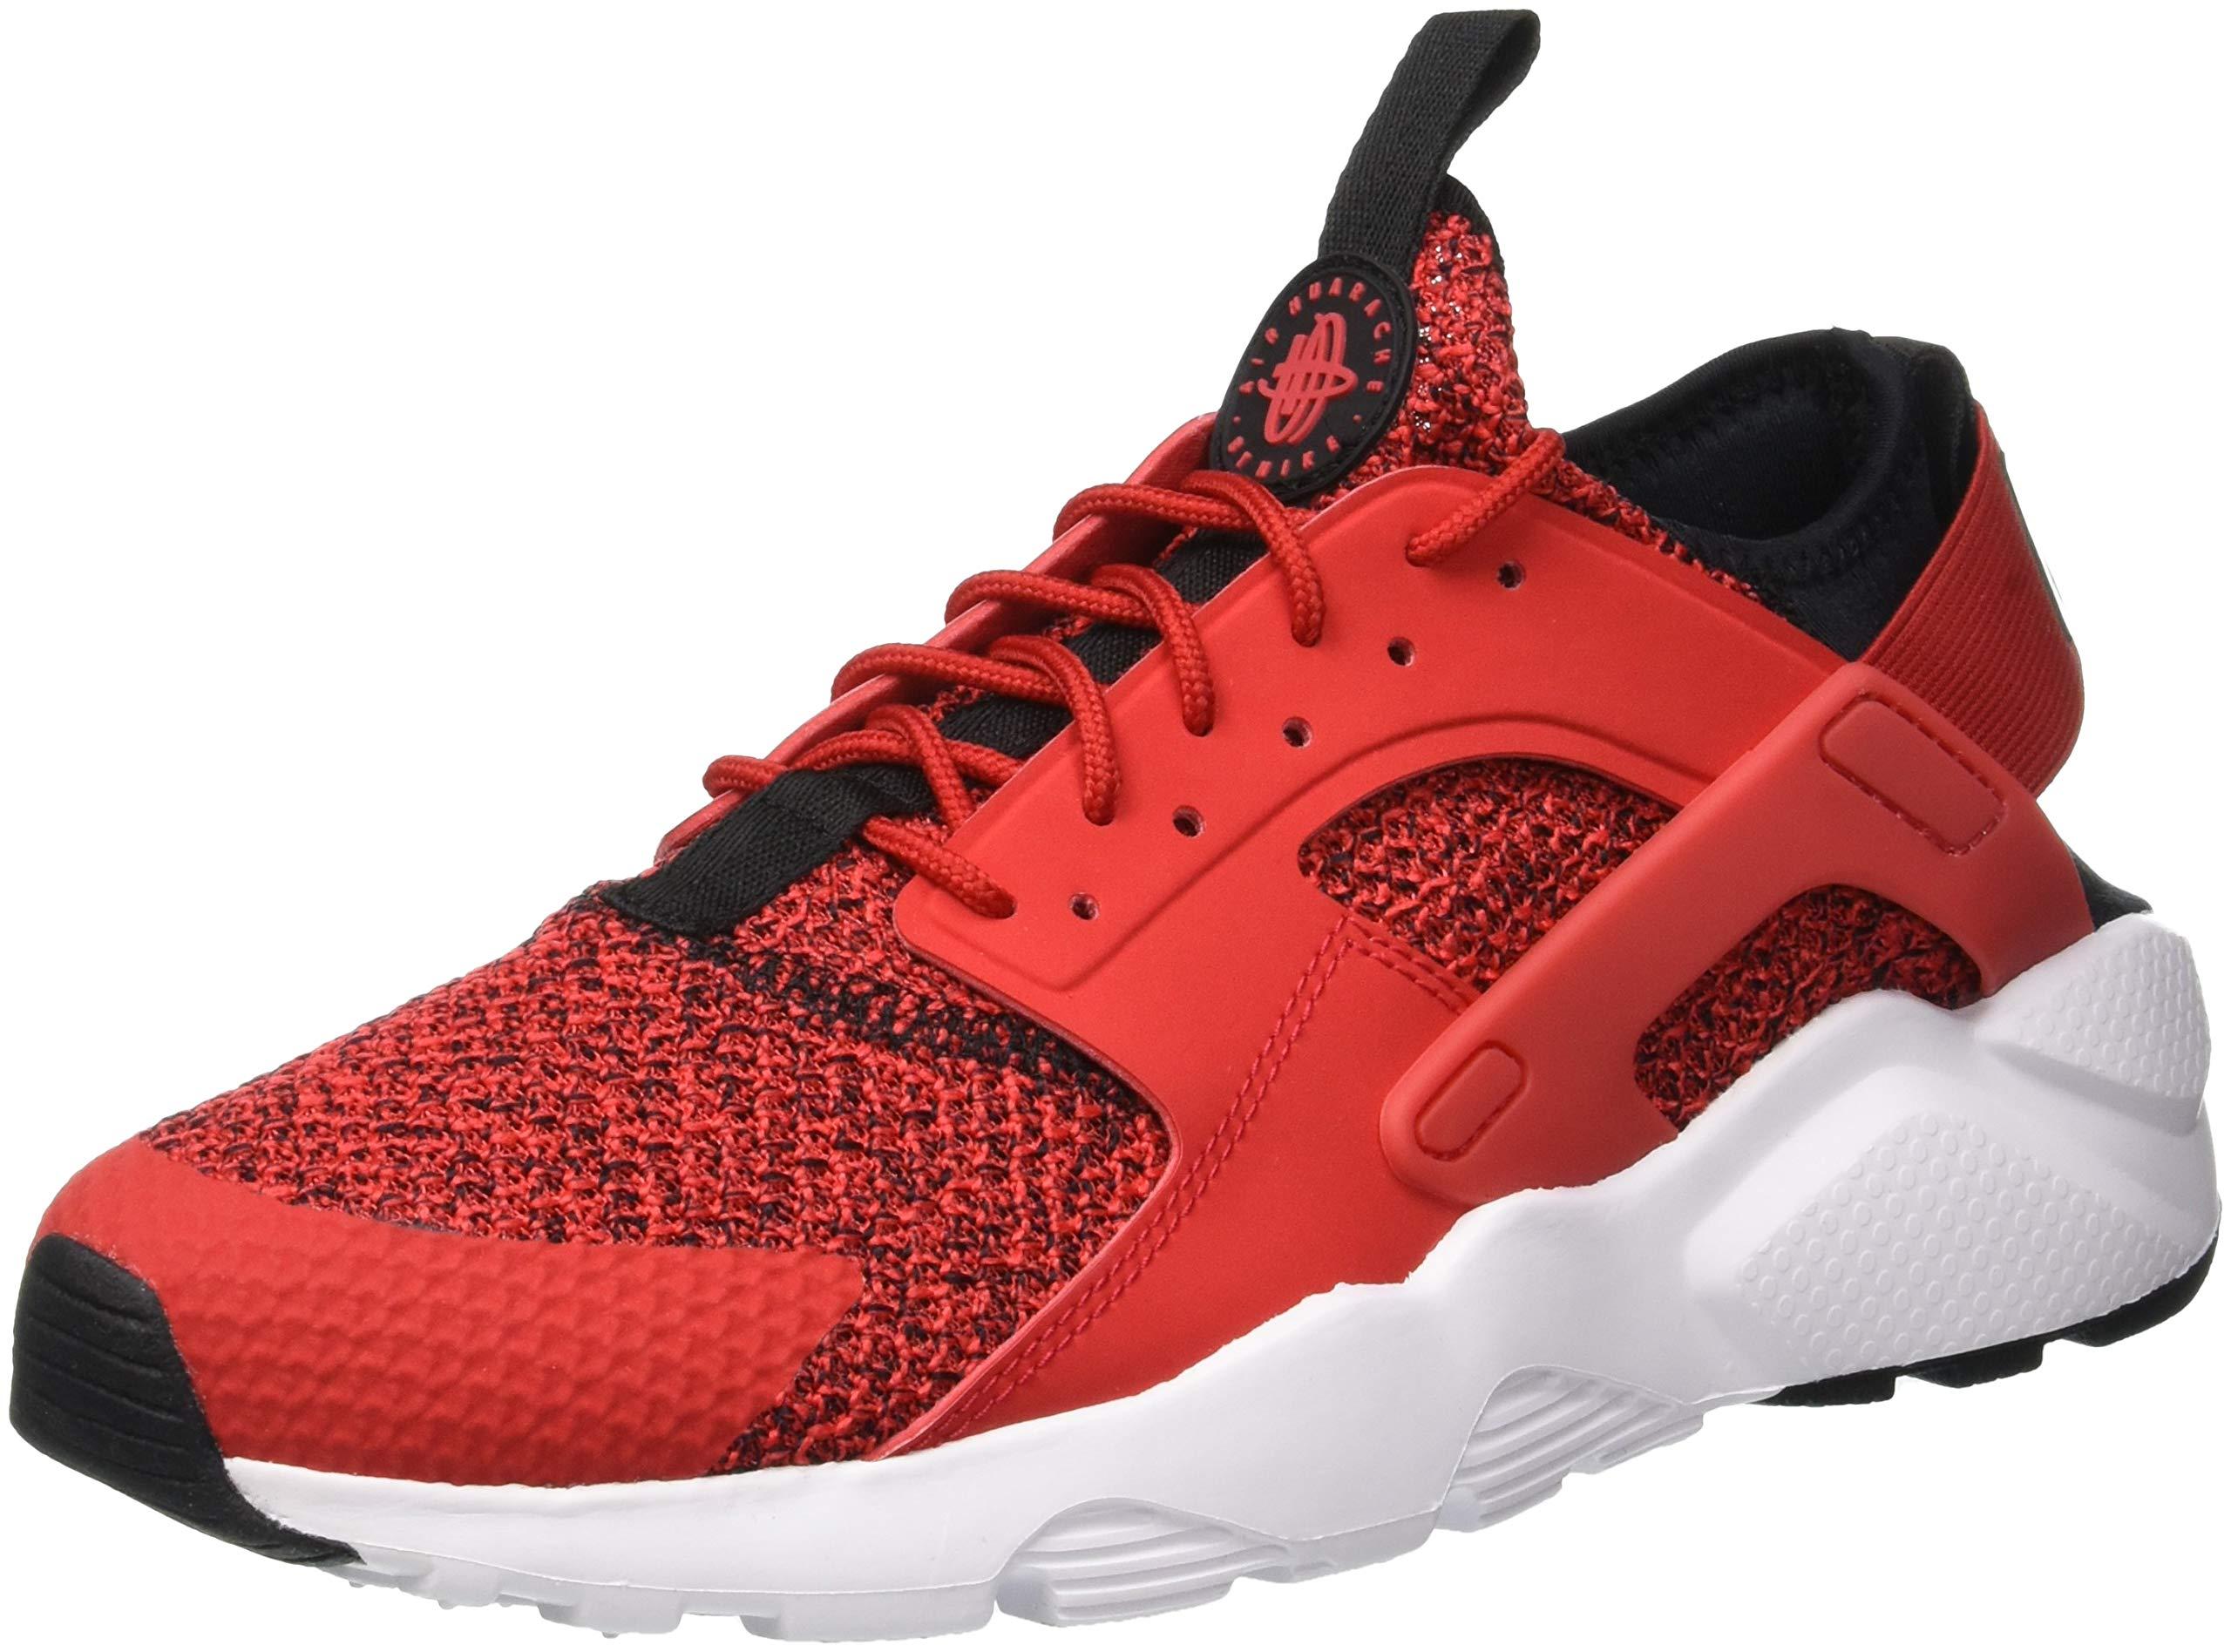 new arrival a89f1 8c1a1 Galleon - Nike Men s Air Huarache Run Ultra SE Shoe - 875841 (11.5 D(M) US,  University Red Black-White)